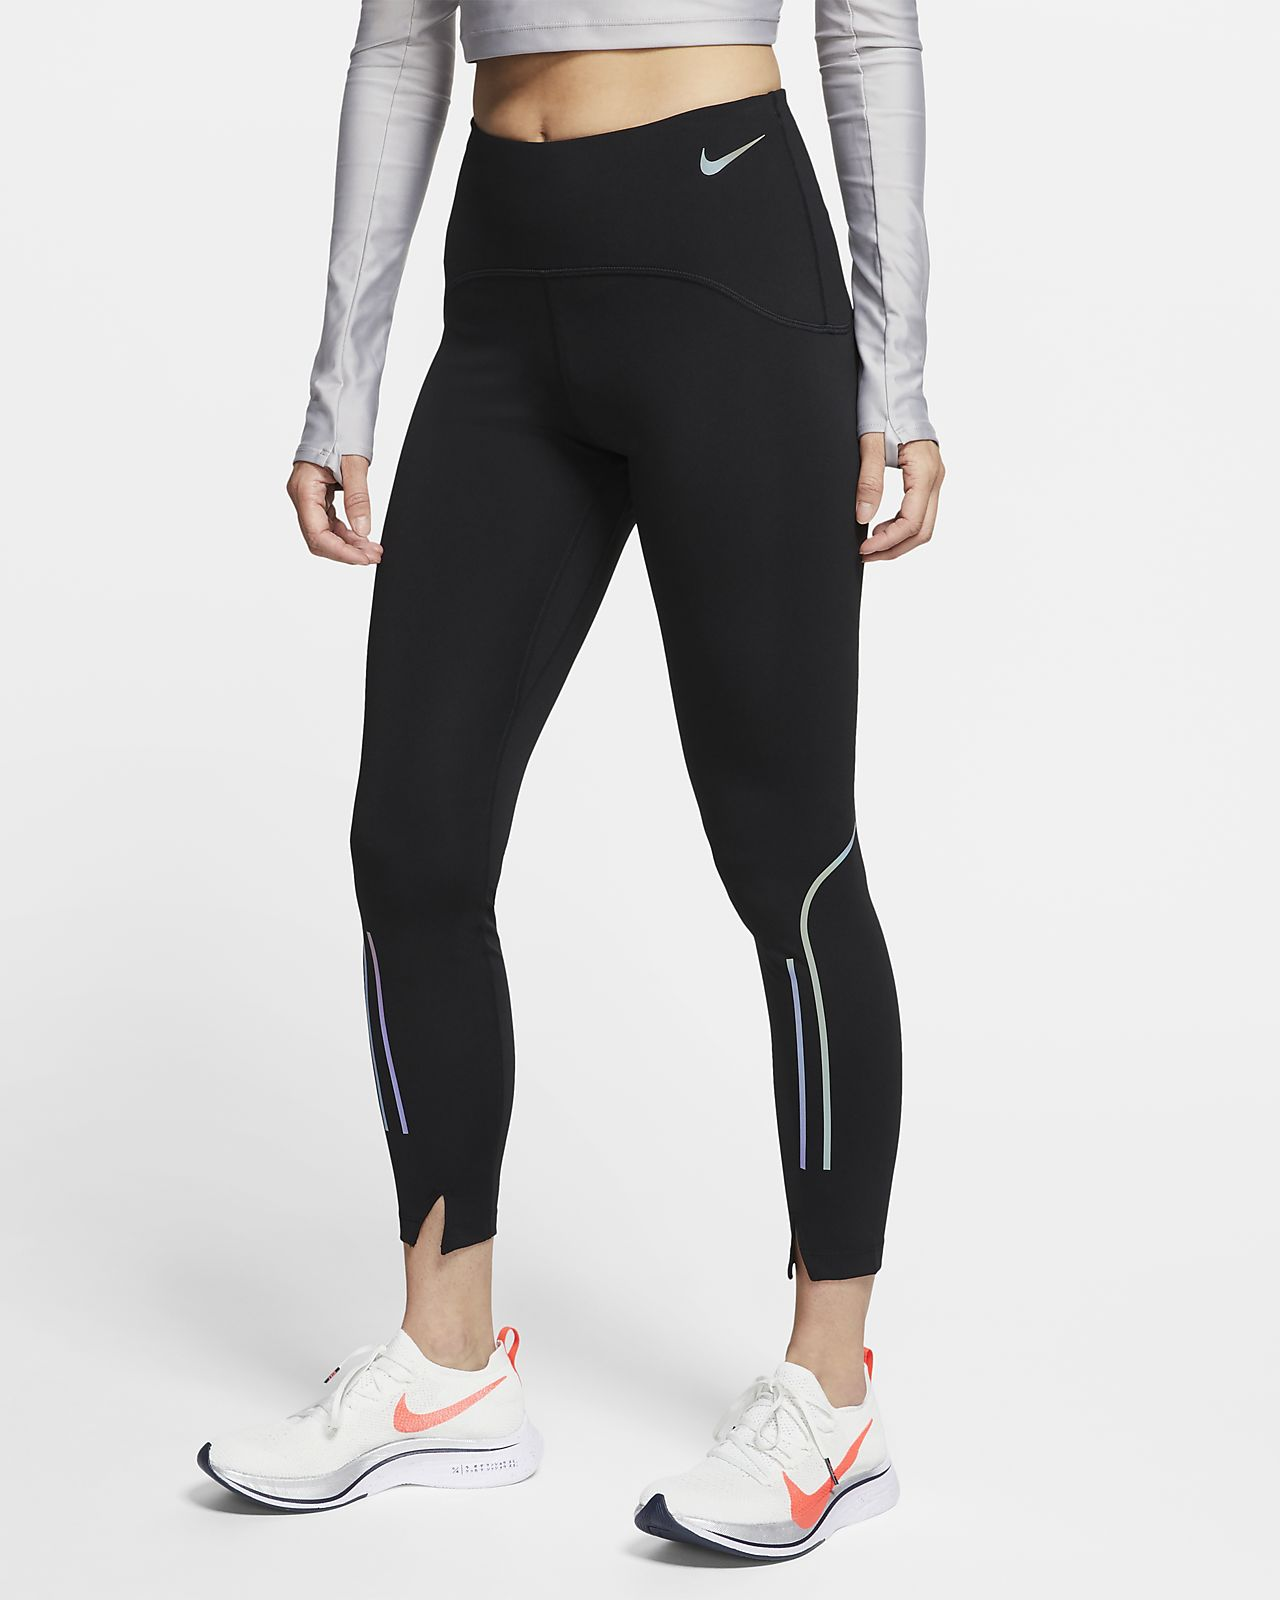 Tight de running 7/8 Nike Speed pour Femme